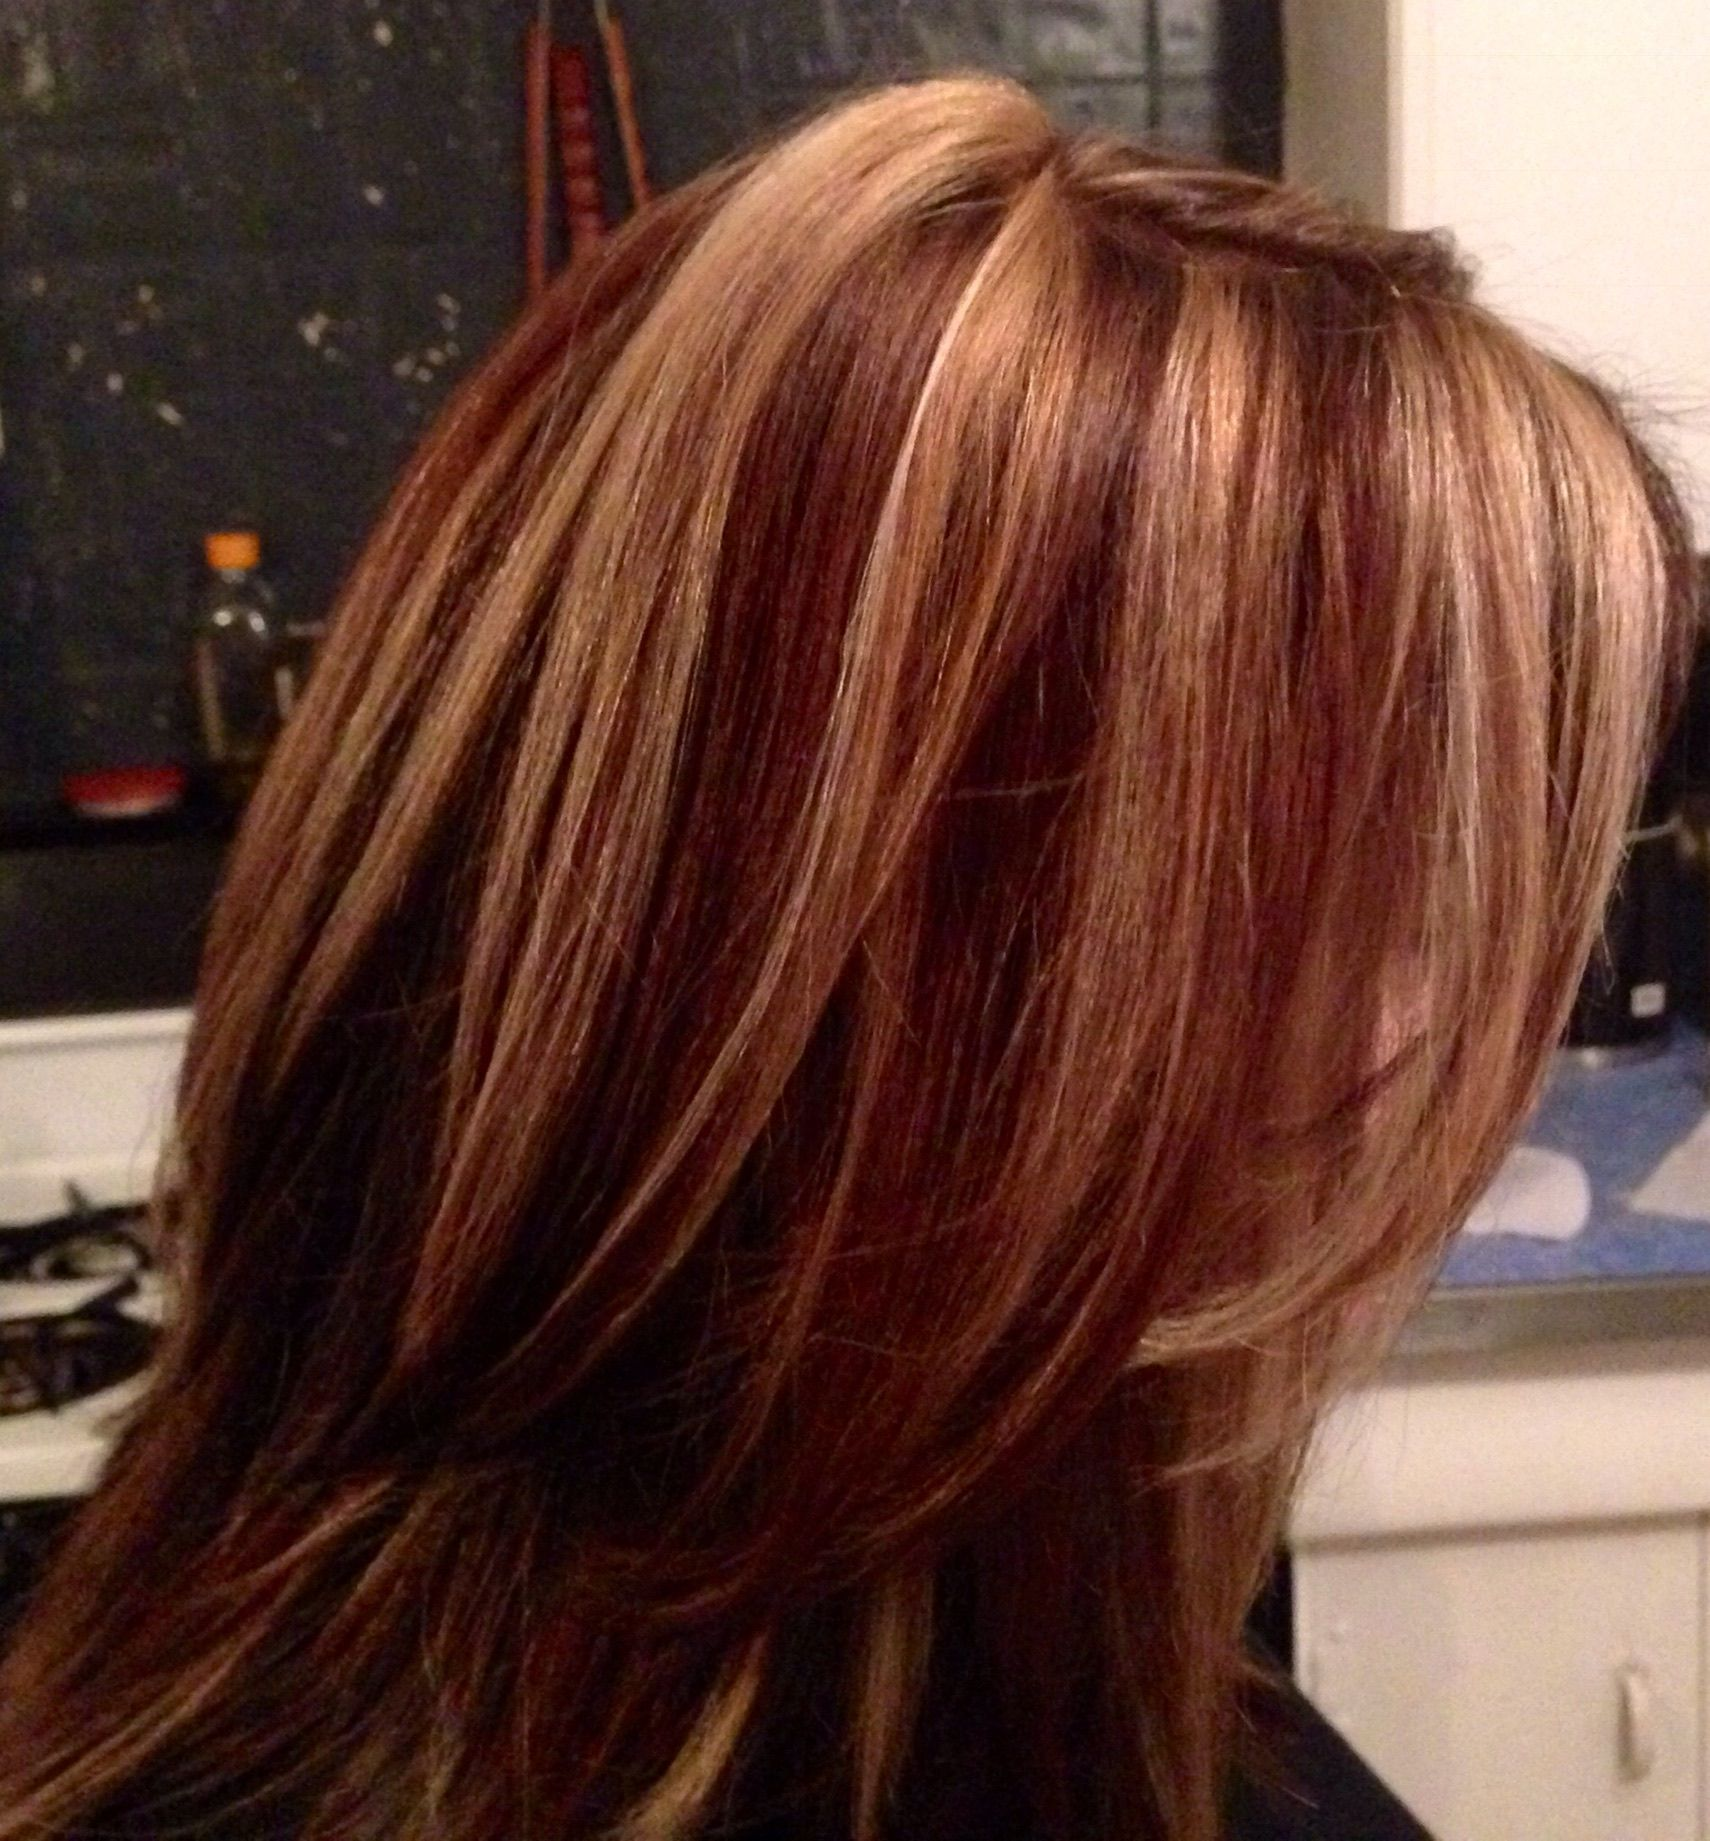 Pin by isabel vidal on short hair styles pinterest hair style